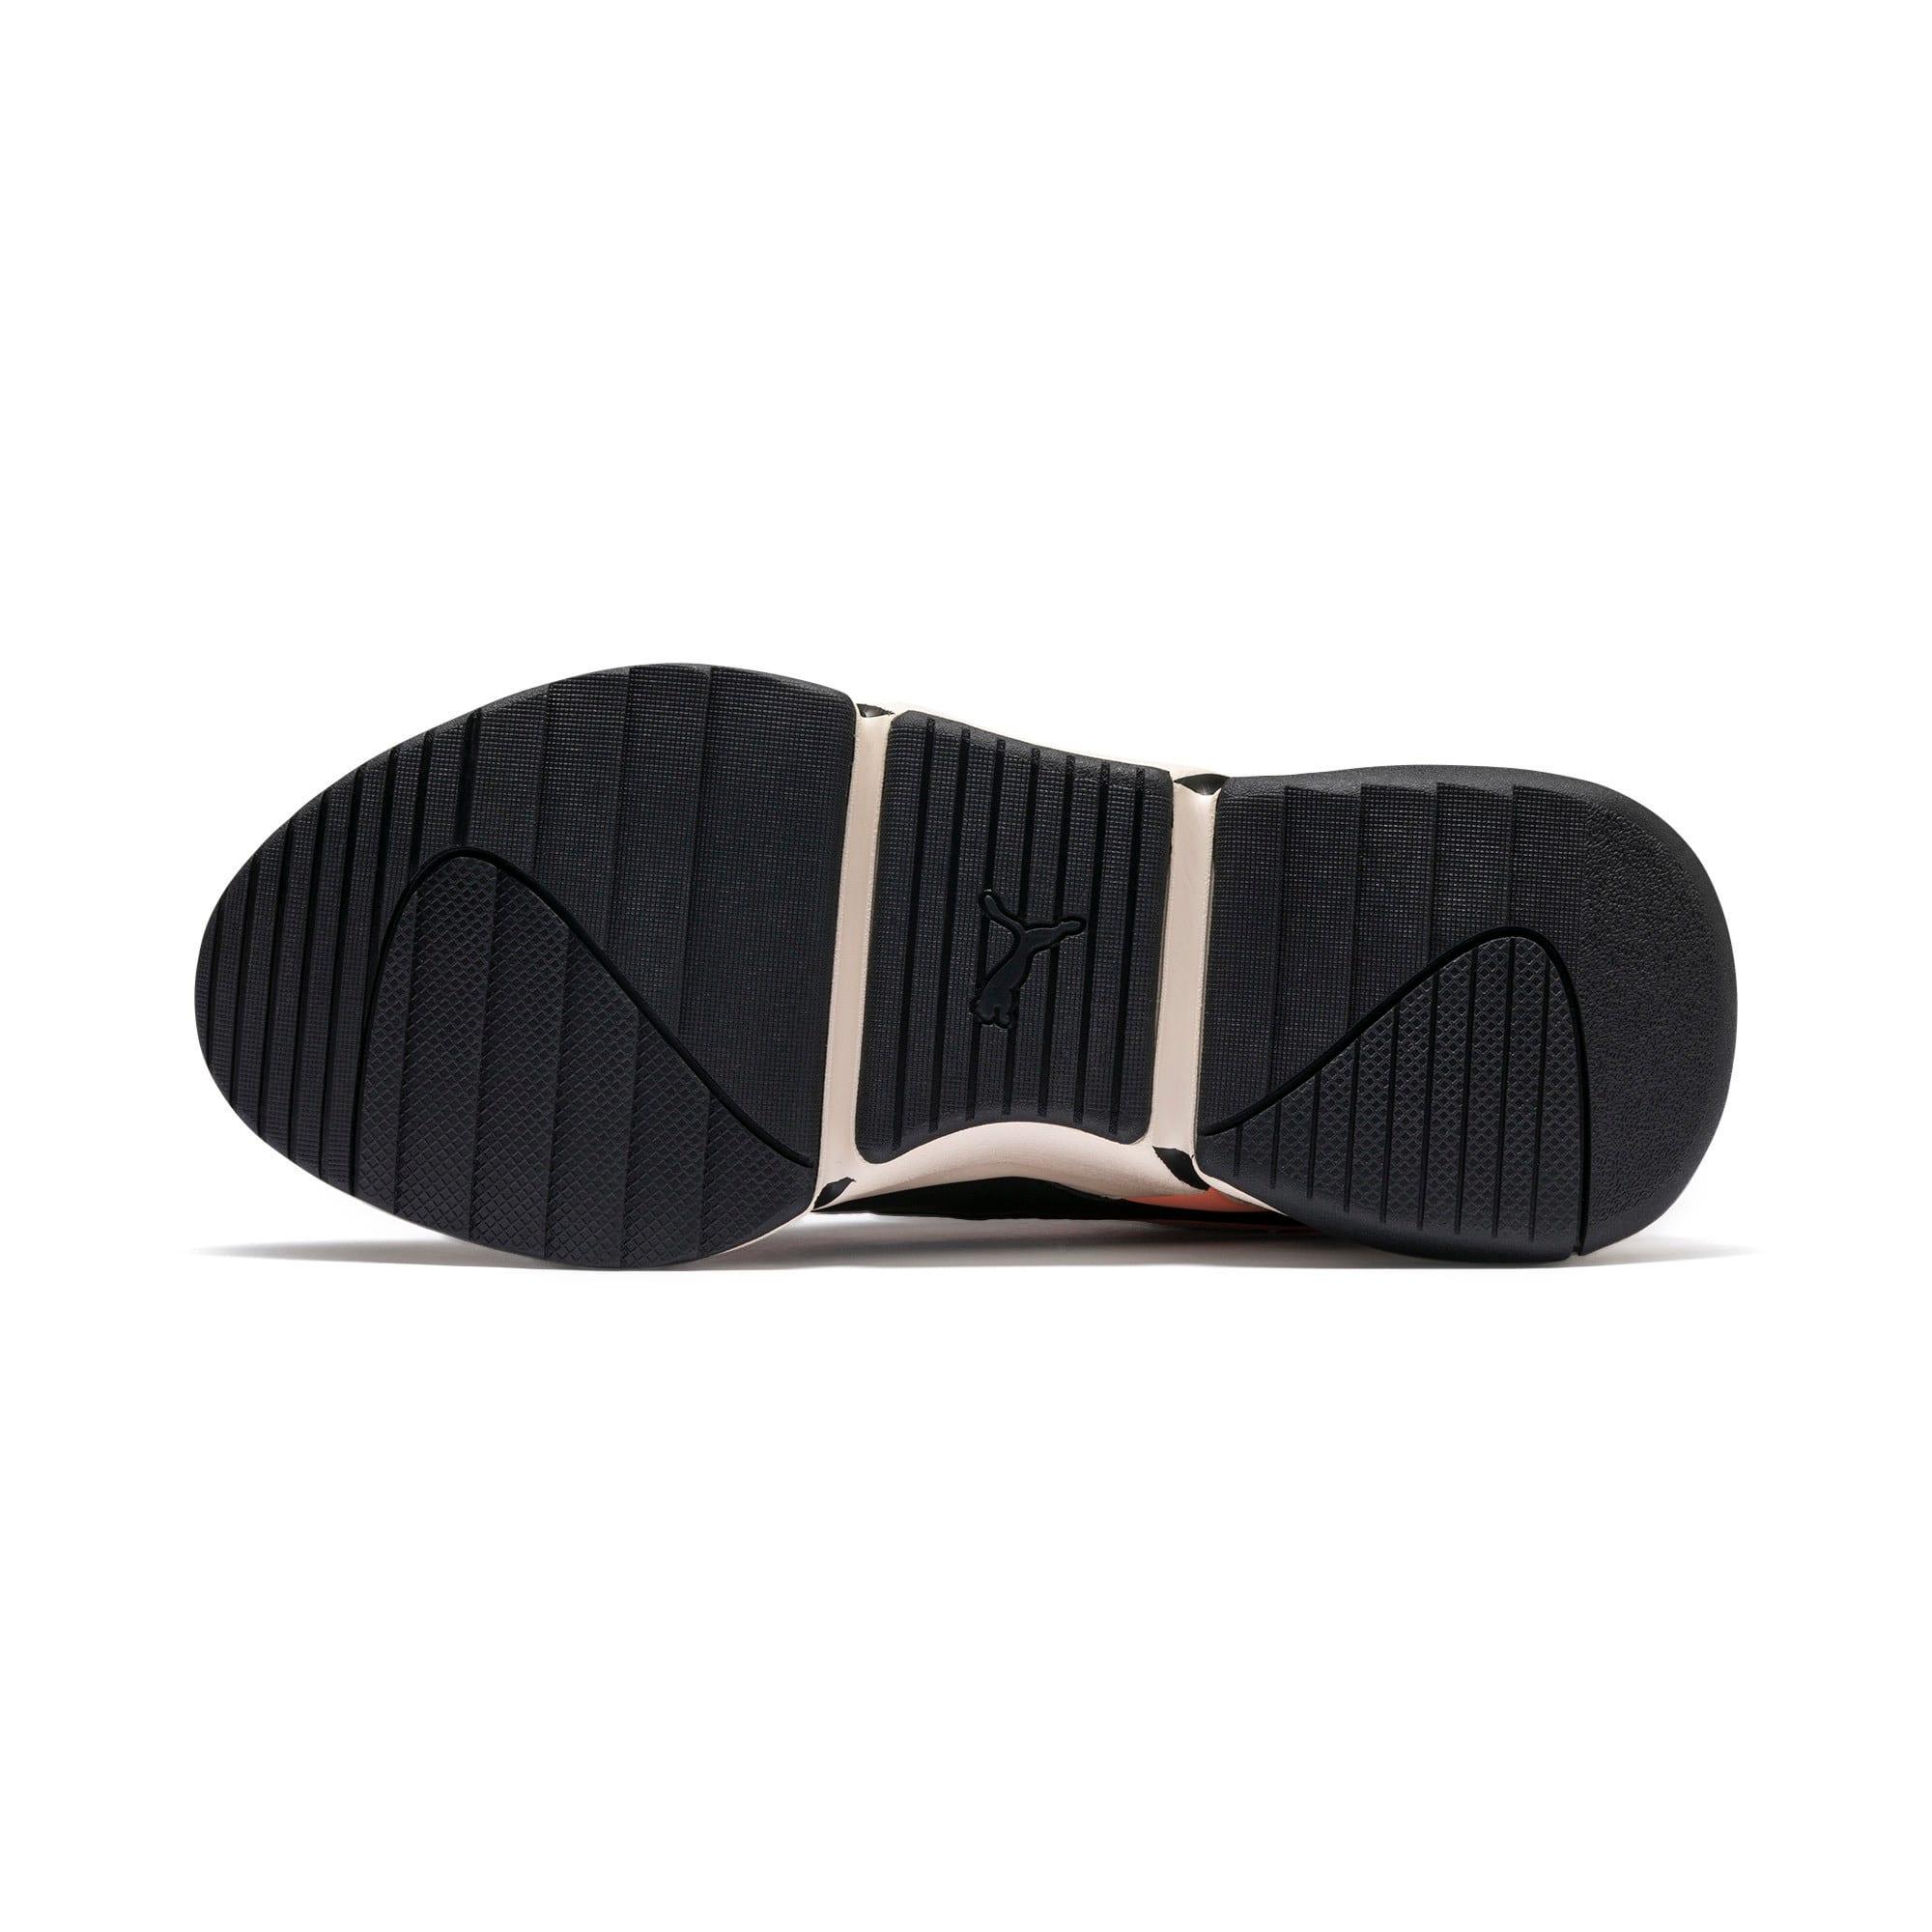 Thumbnail 5 of PUMA x SUE TSAI Nova Cherry Bombs sneakers voor dames, Powder Puff-Puma Black, medium